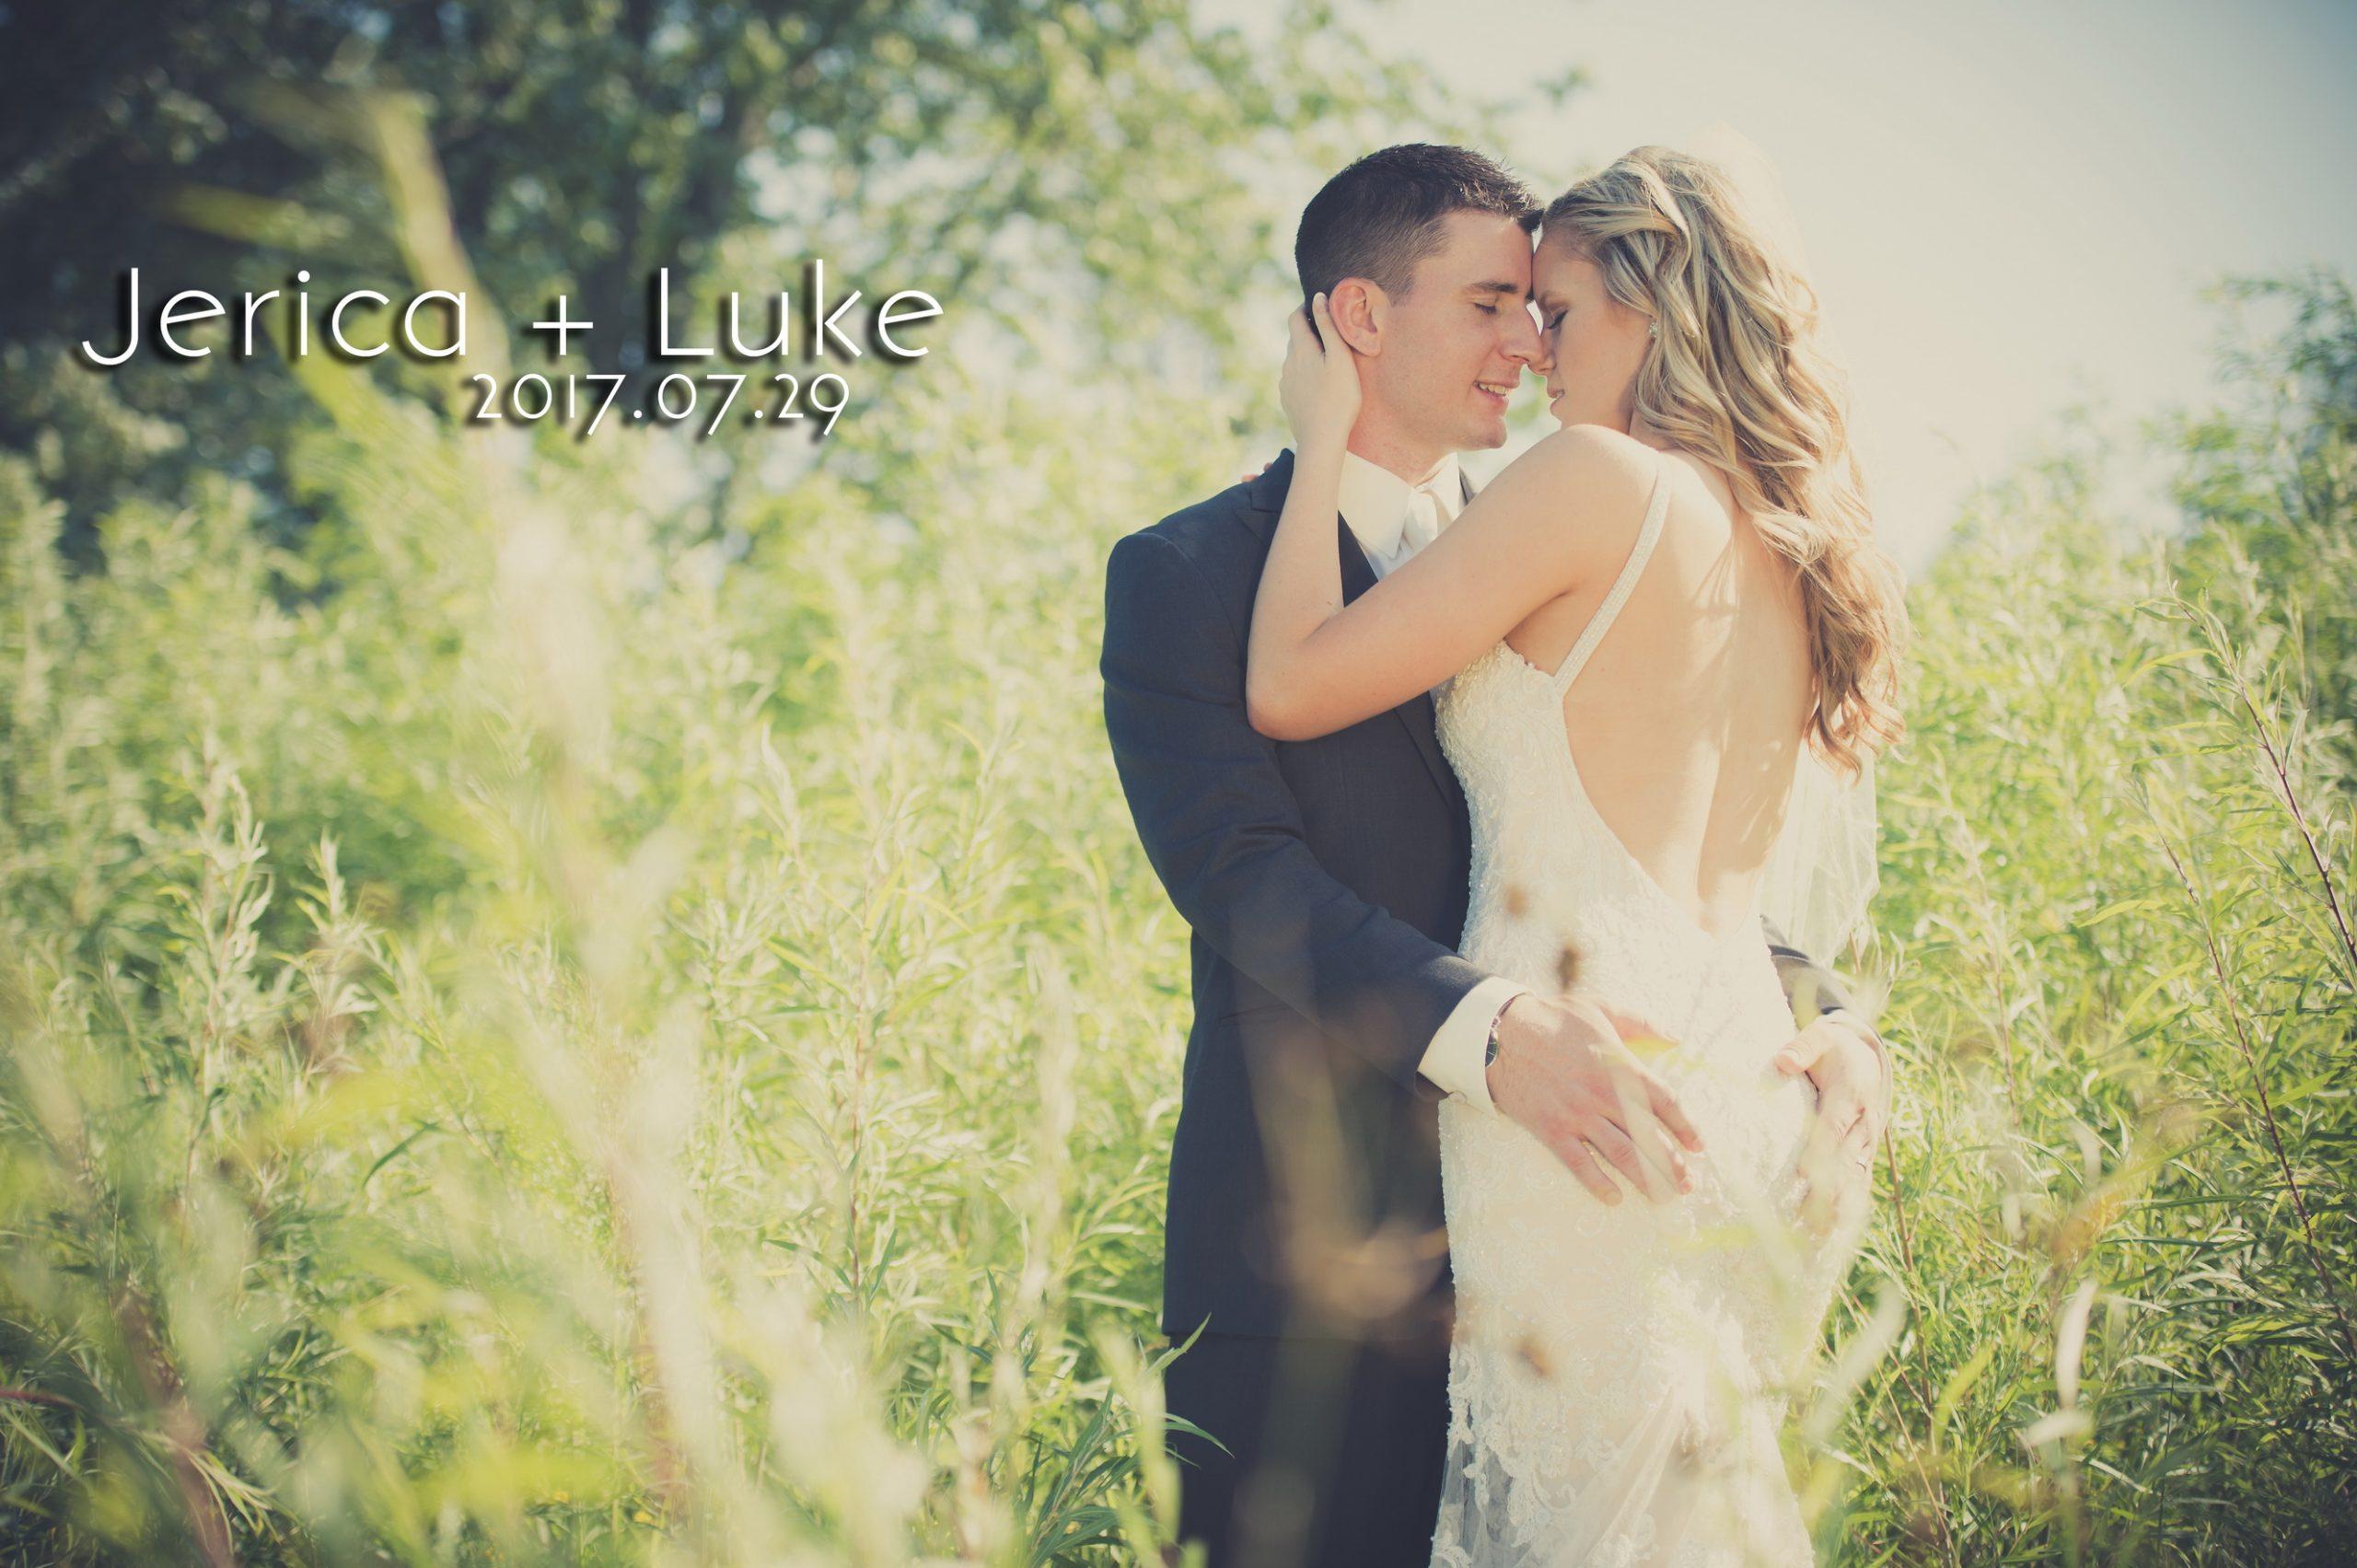 arthur_wedding_photographer01